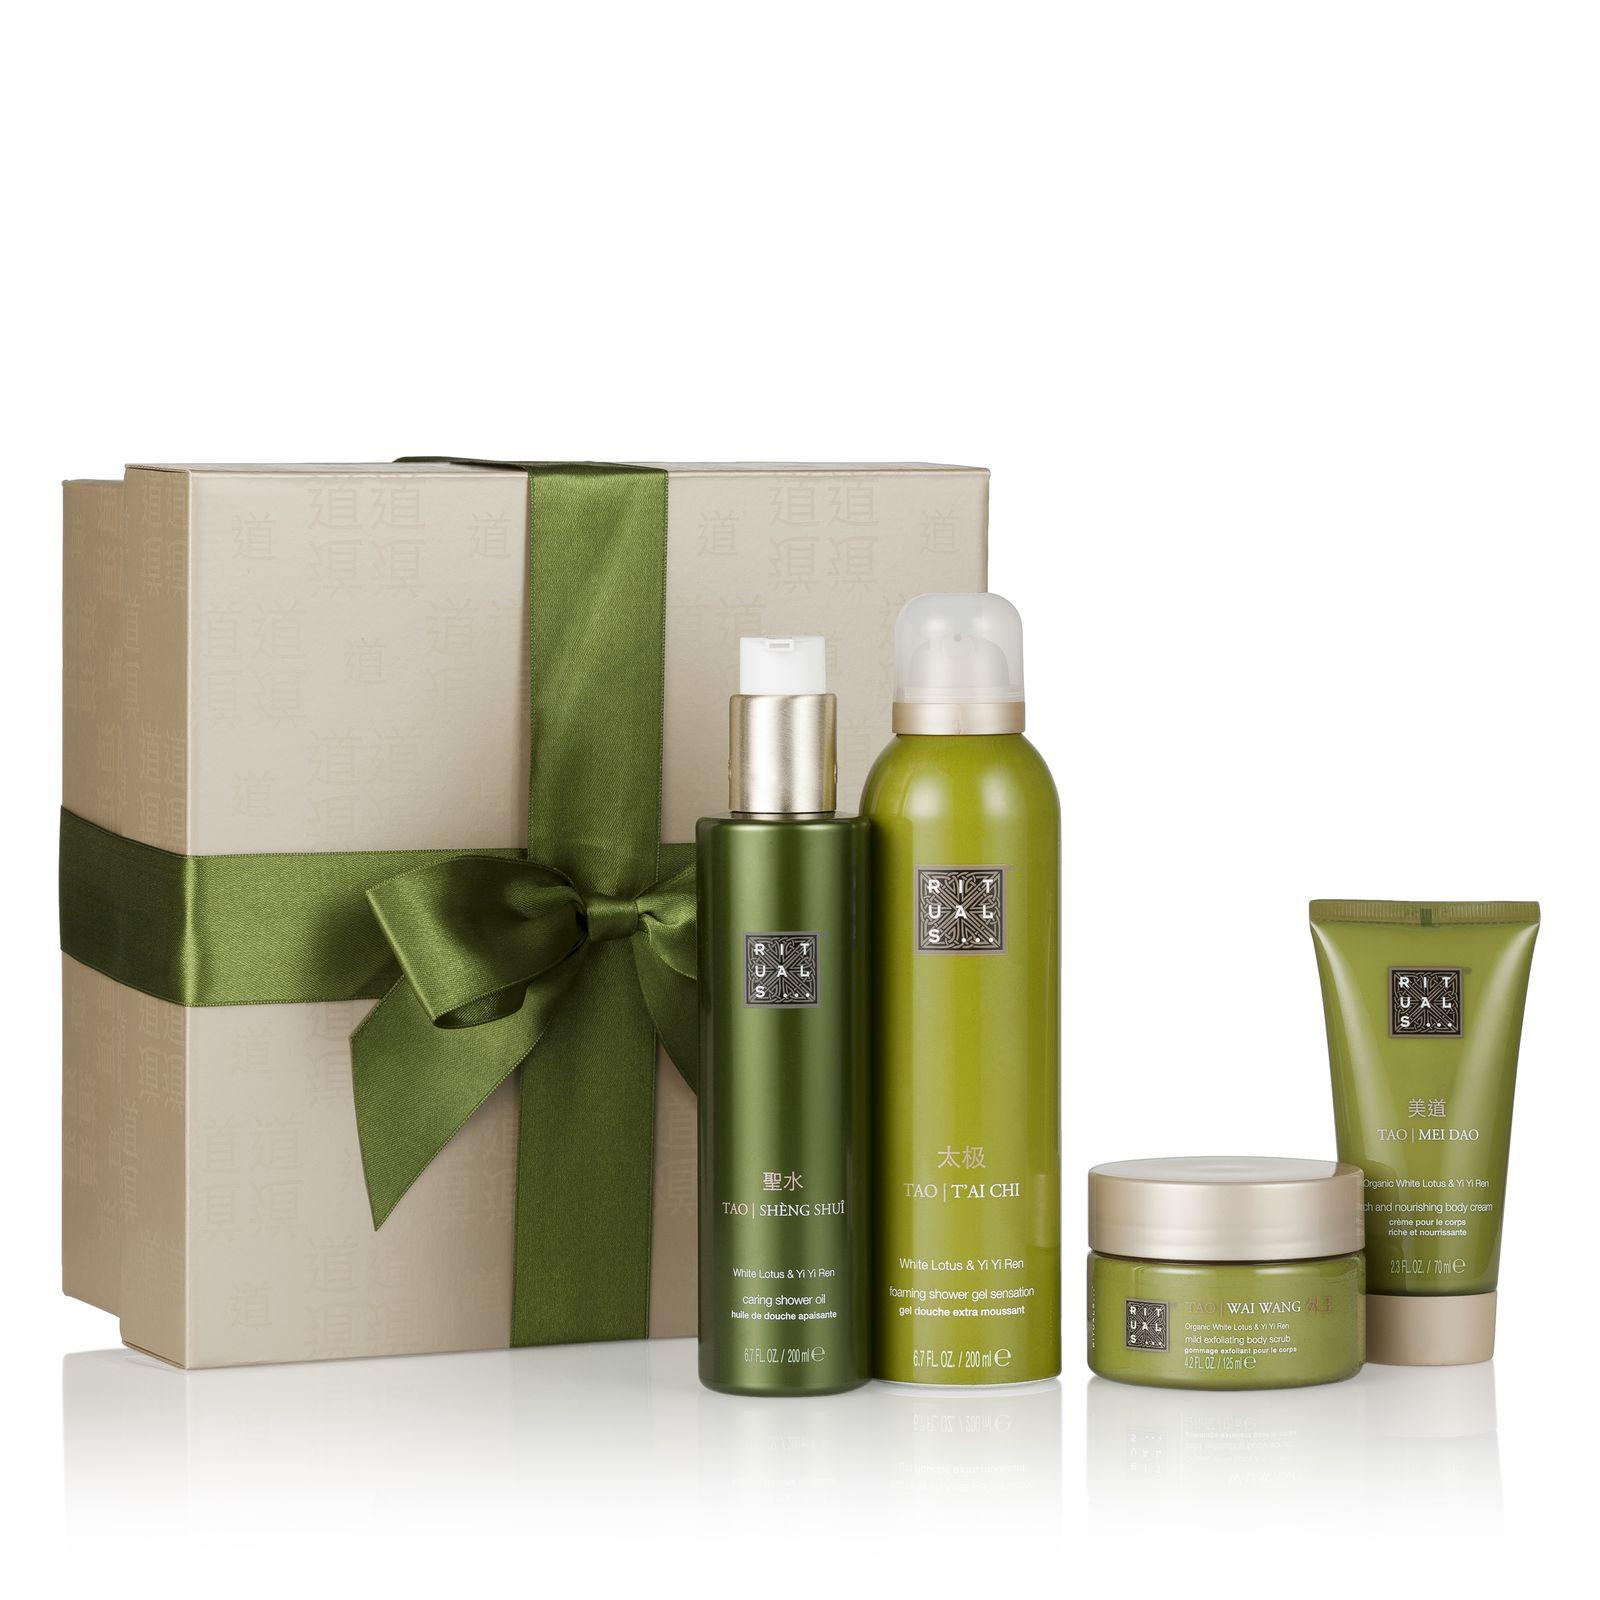 RITUALS cosmetics (Image 3)